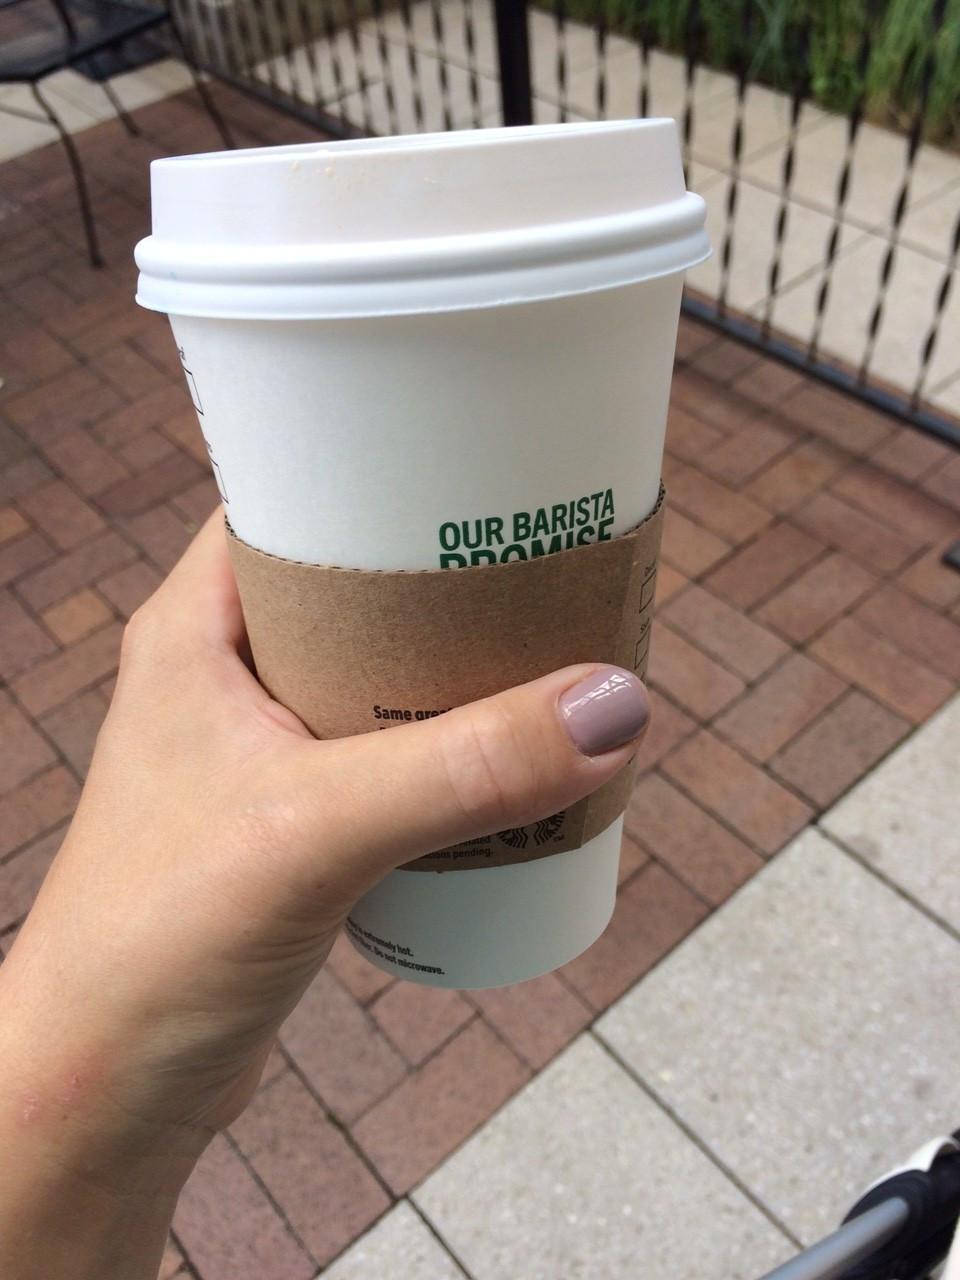 starbucks-p-s-l-starbs-mommy-needs-coffee-run-to-starbucks-writer-lifestyle